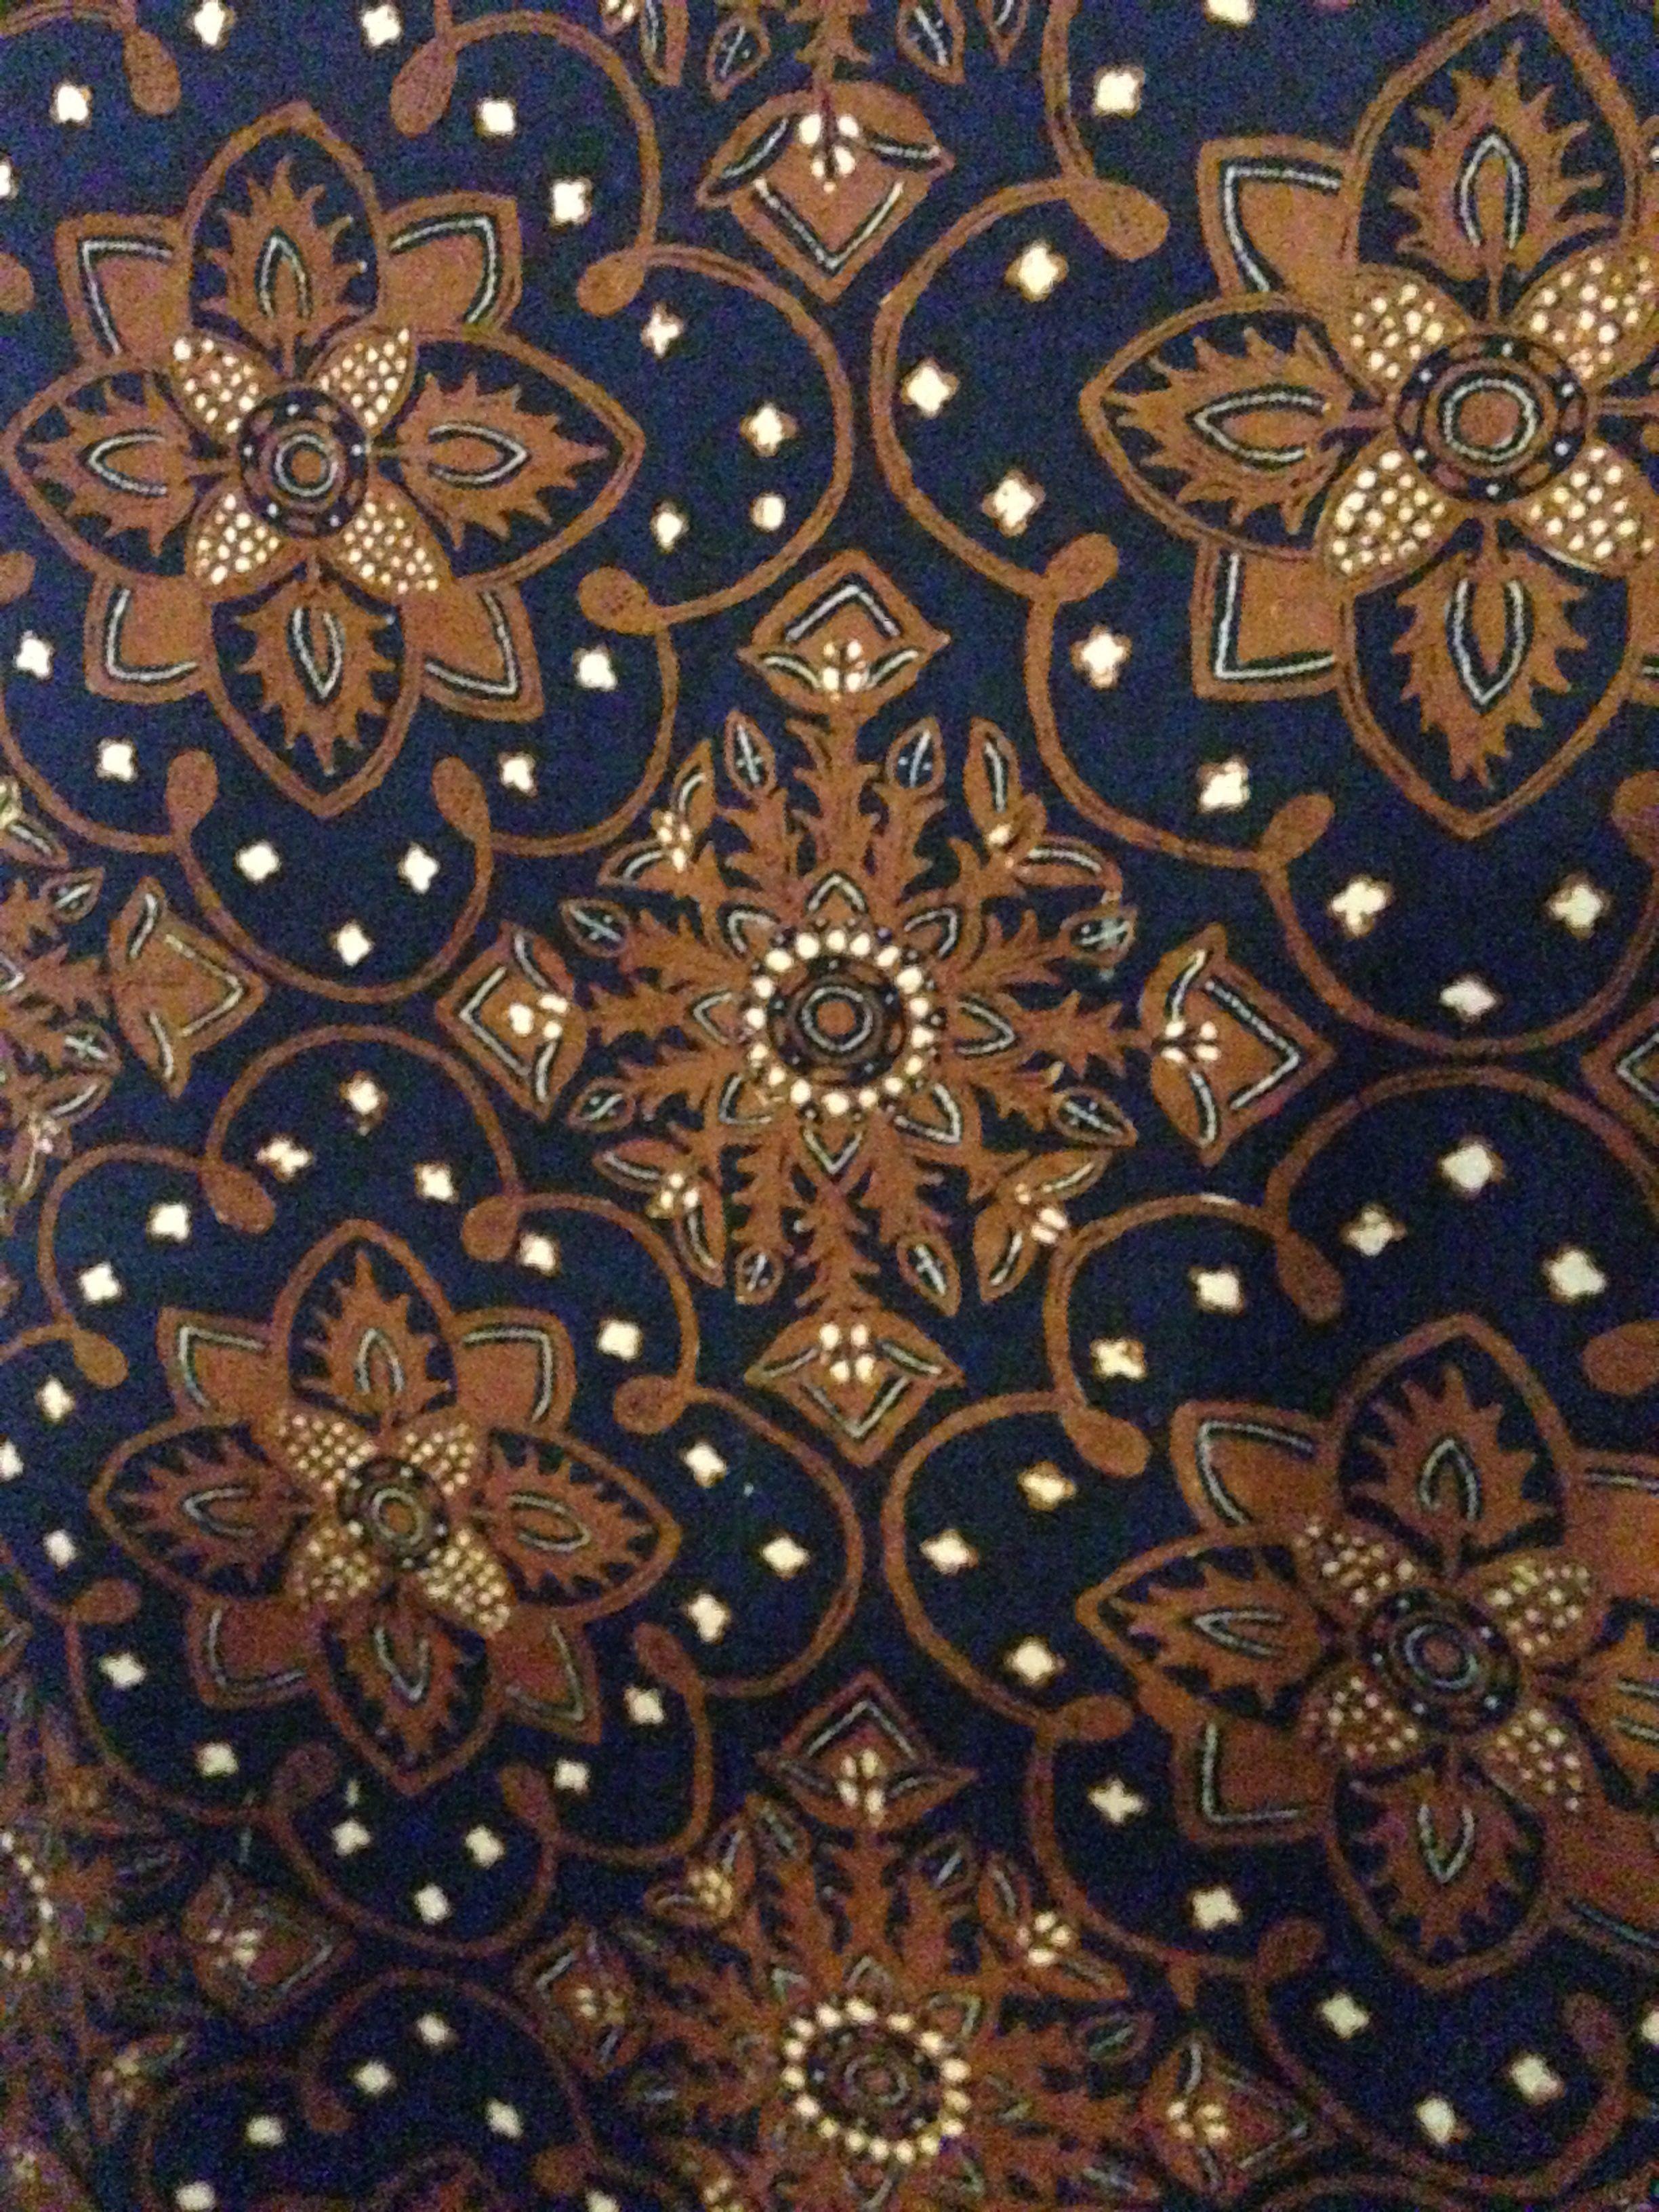 Cara Pembuatan Batik : pembuatan, batik, ᗷᗩTIK, Ideas, Batik,, Resist,, Indonesian, Batik